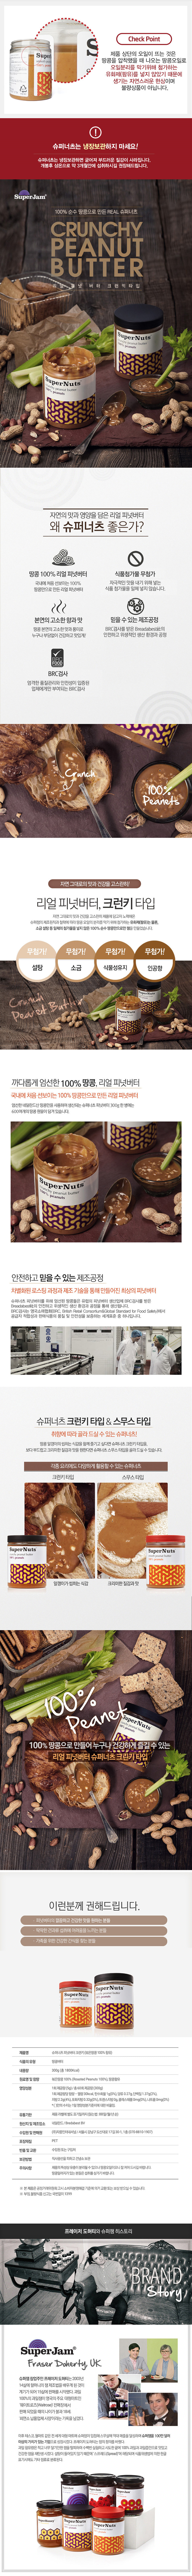 supernuts_web.jpg